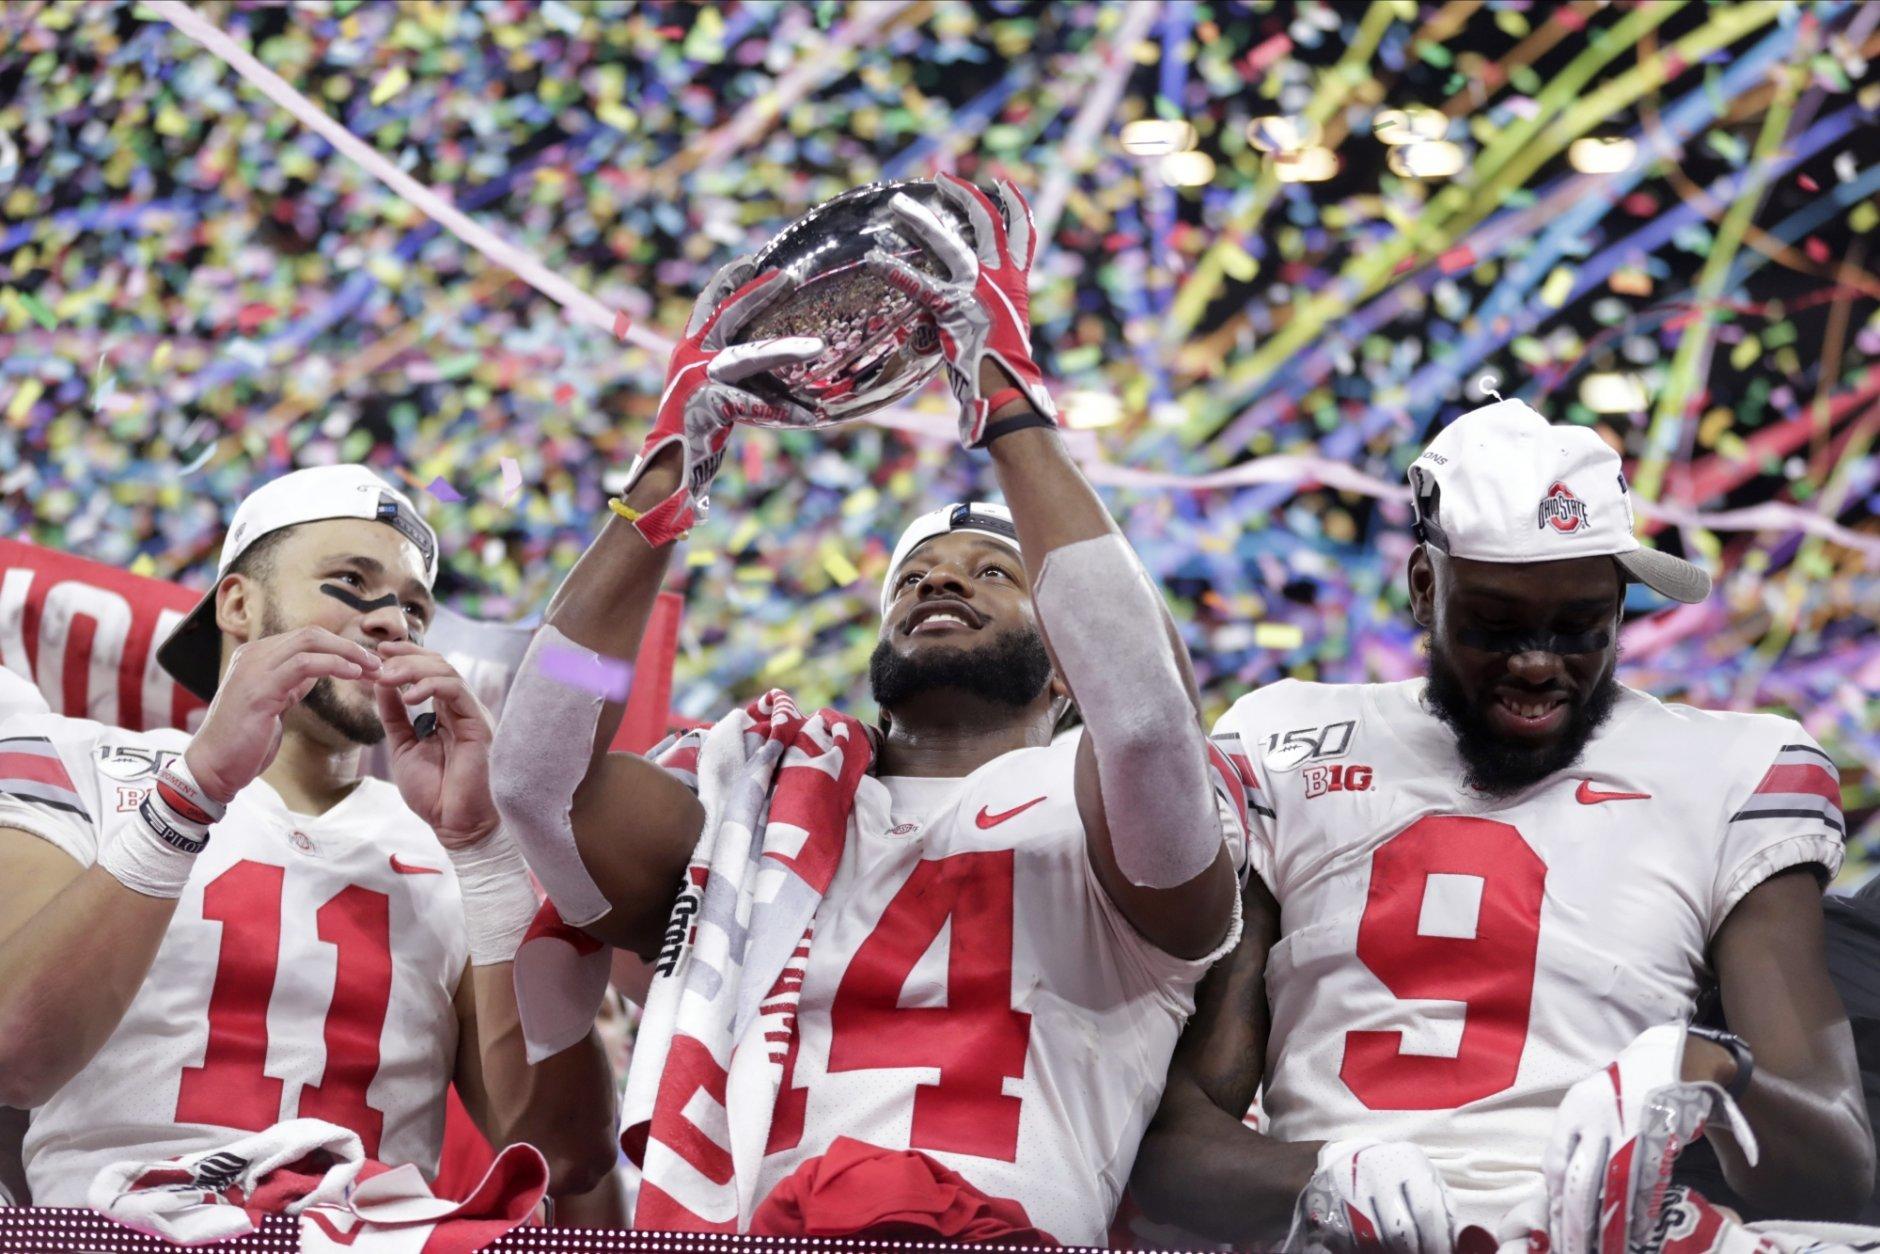 ohio state football championship ten vs clemson playoff lsu college oklahoma conference hill osu trophy wkbn recaps showdowns ncaa pandemic